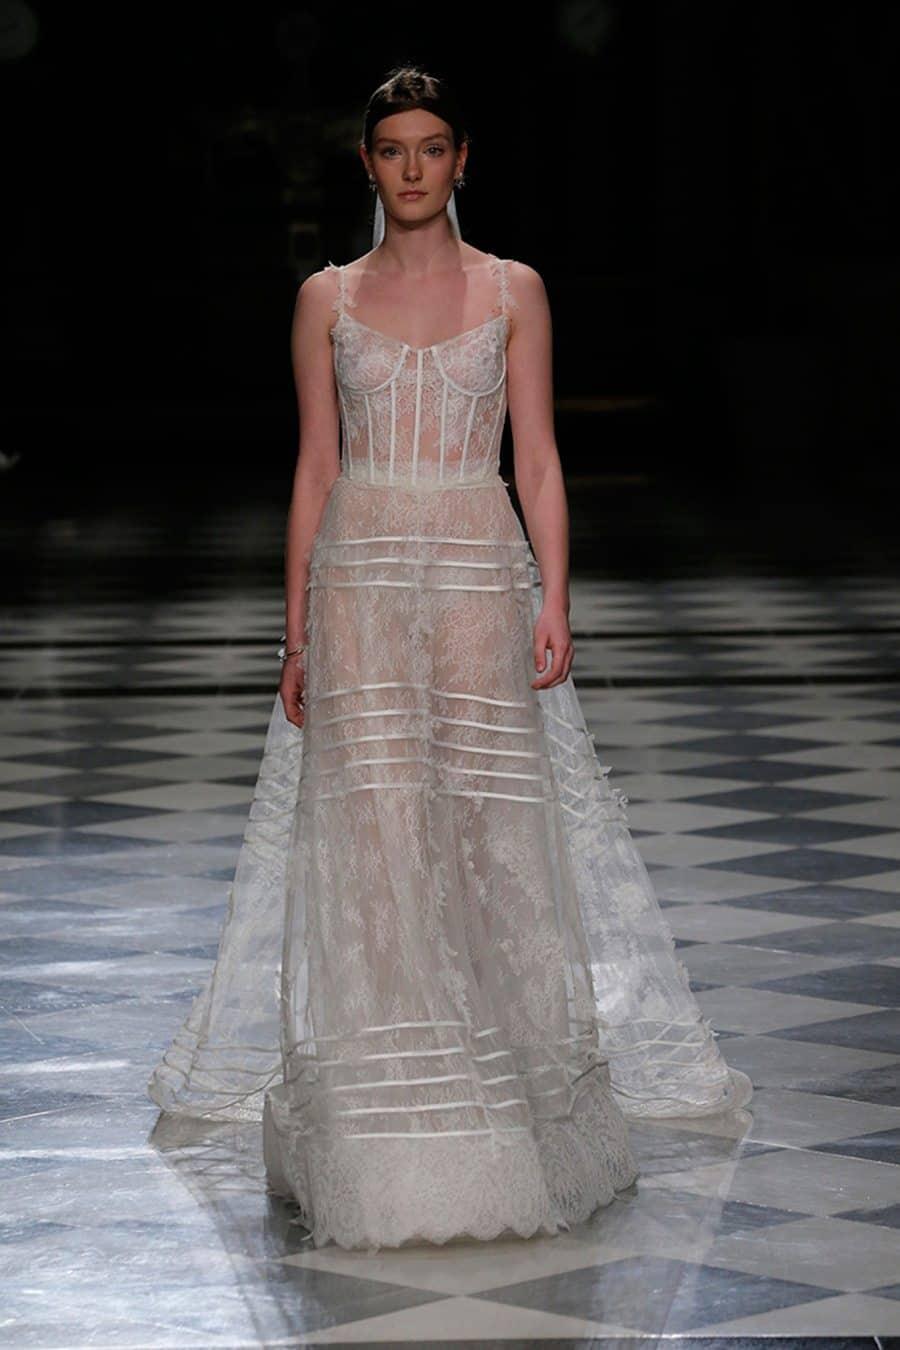 bride-high-fashion-couture-weddingdress-wedding-bridedress-couturedress-highfashion-yolancris-62